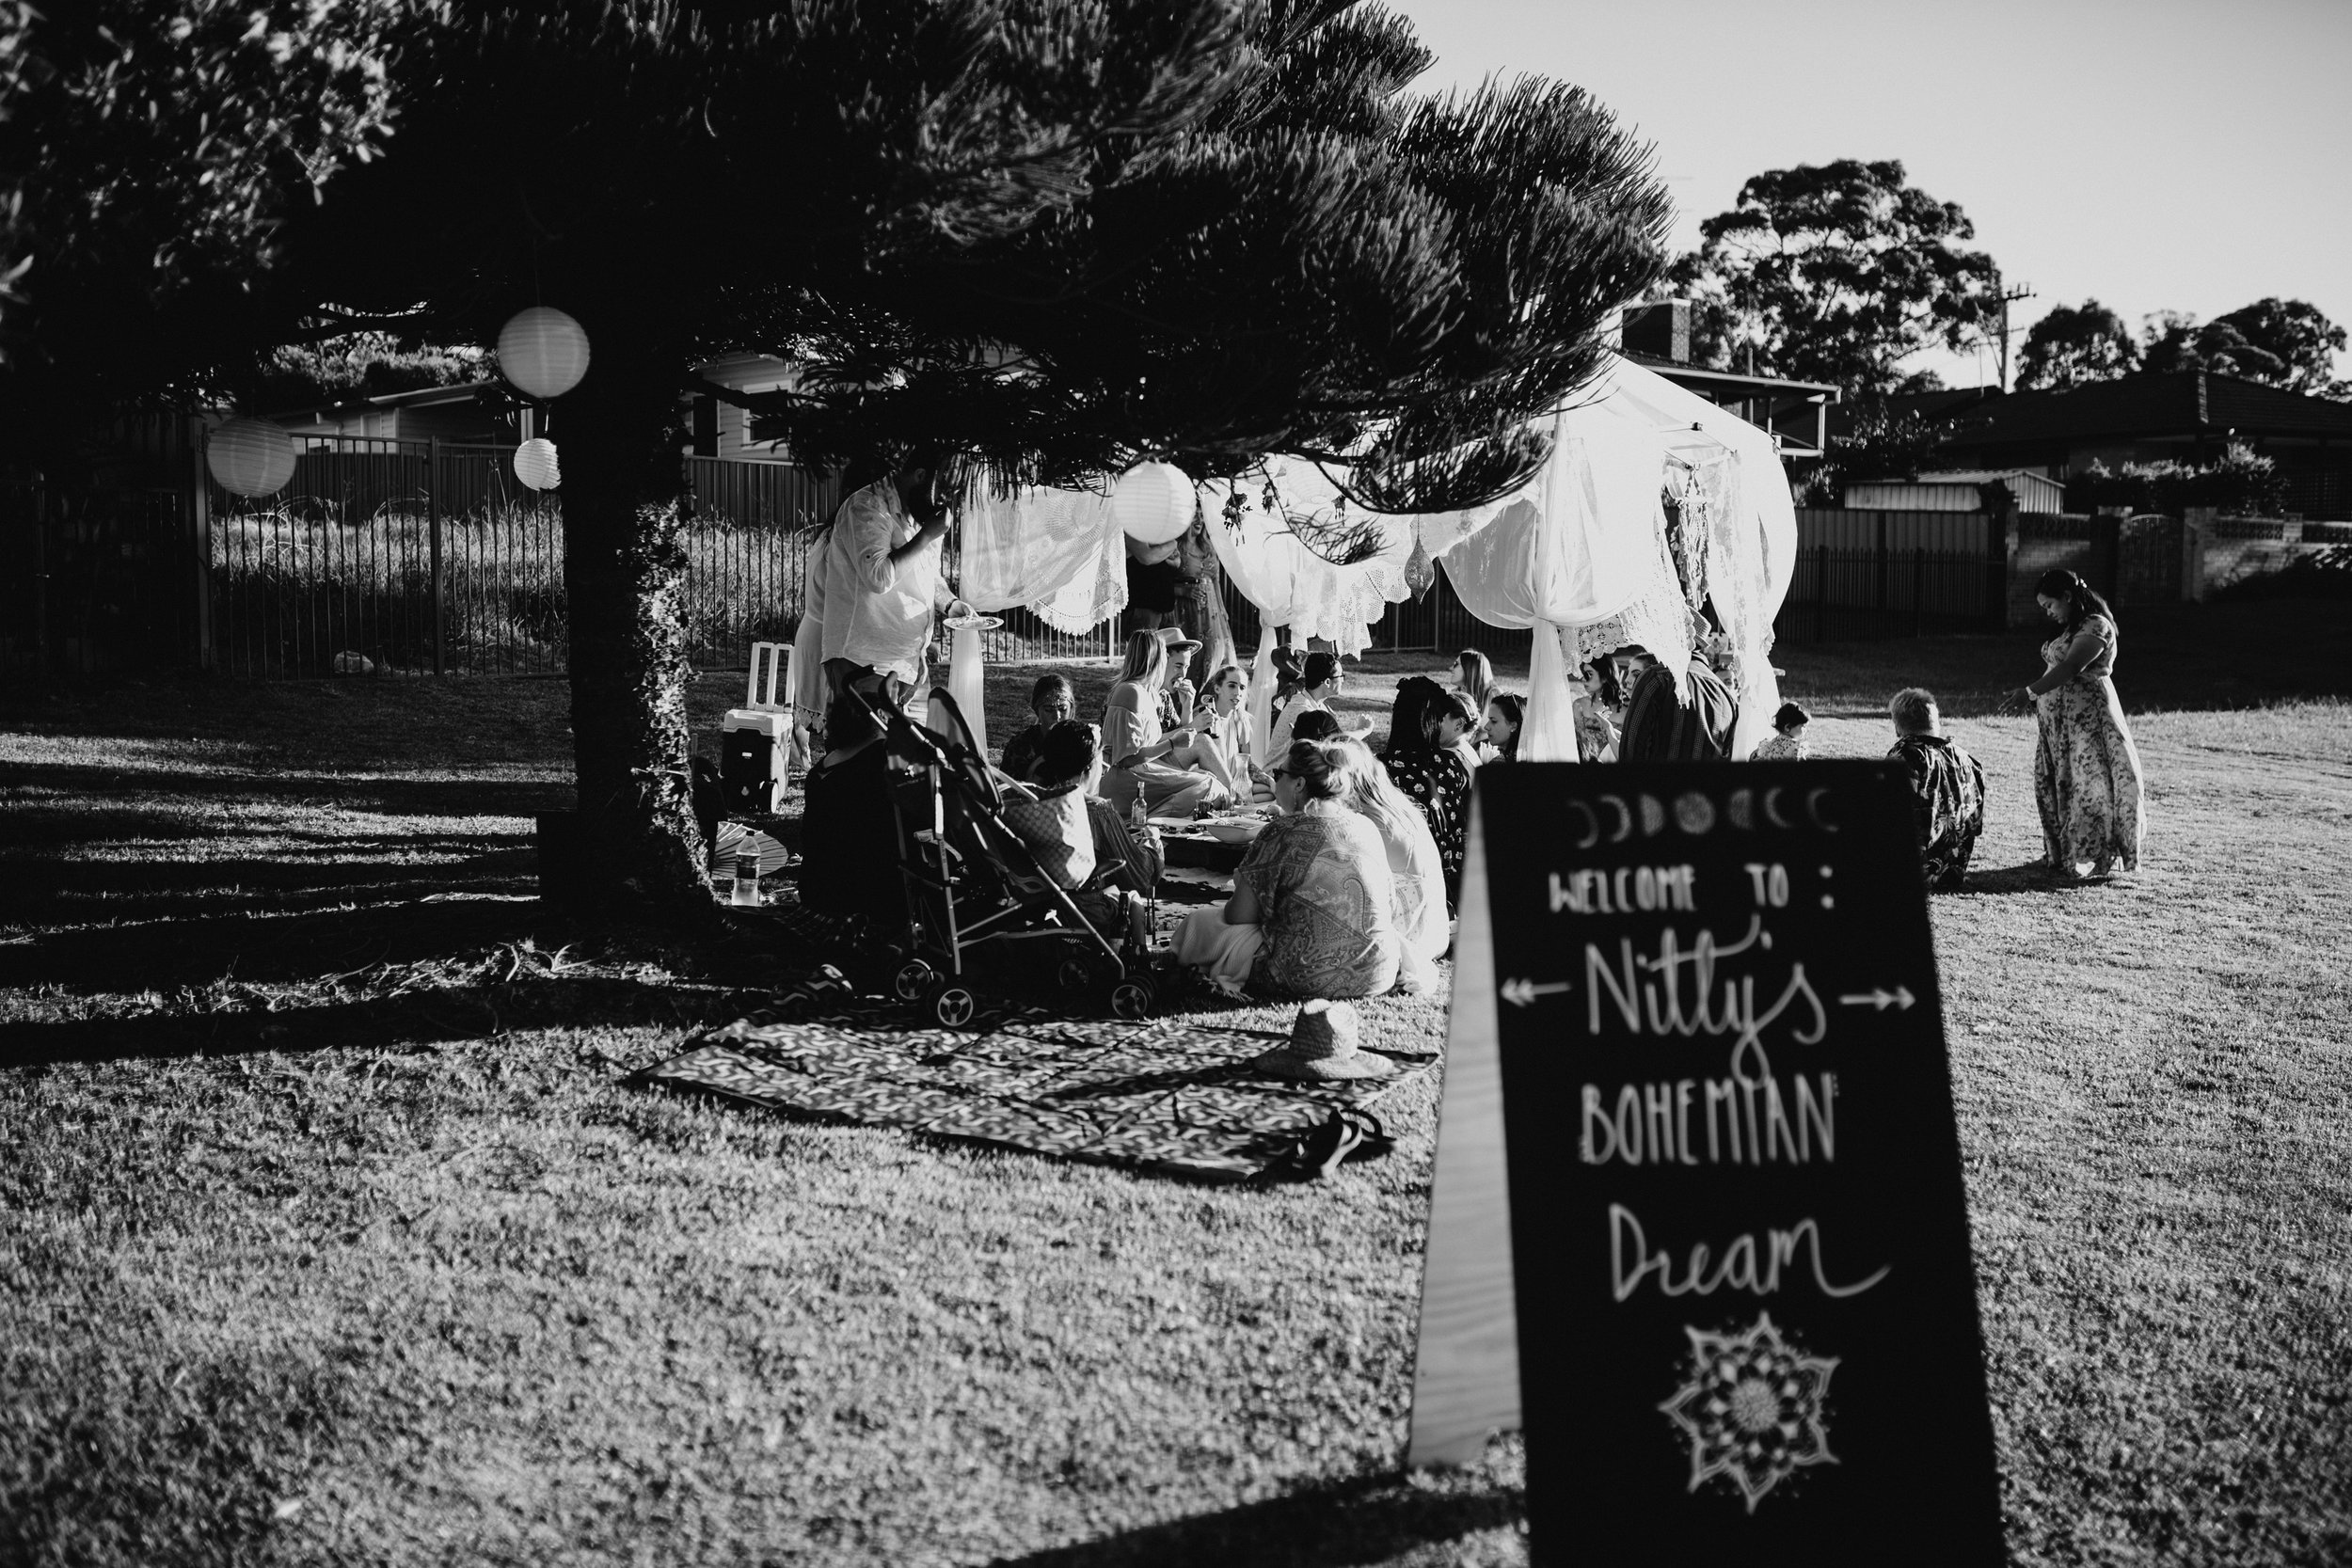 Nitty's Birthday- Bohemian Dream Birthday- Lake Illawarra-3.jpg